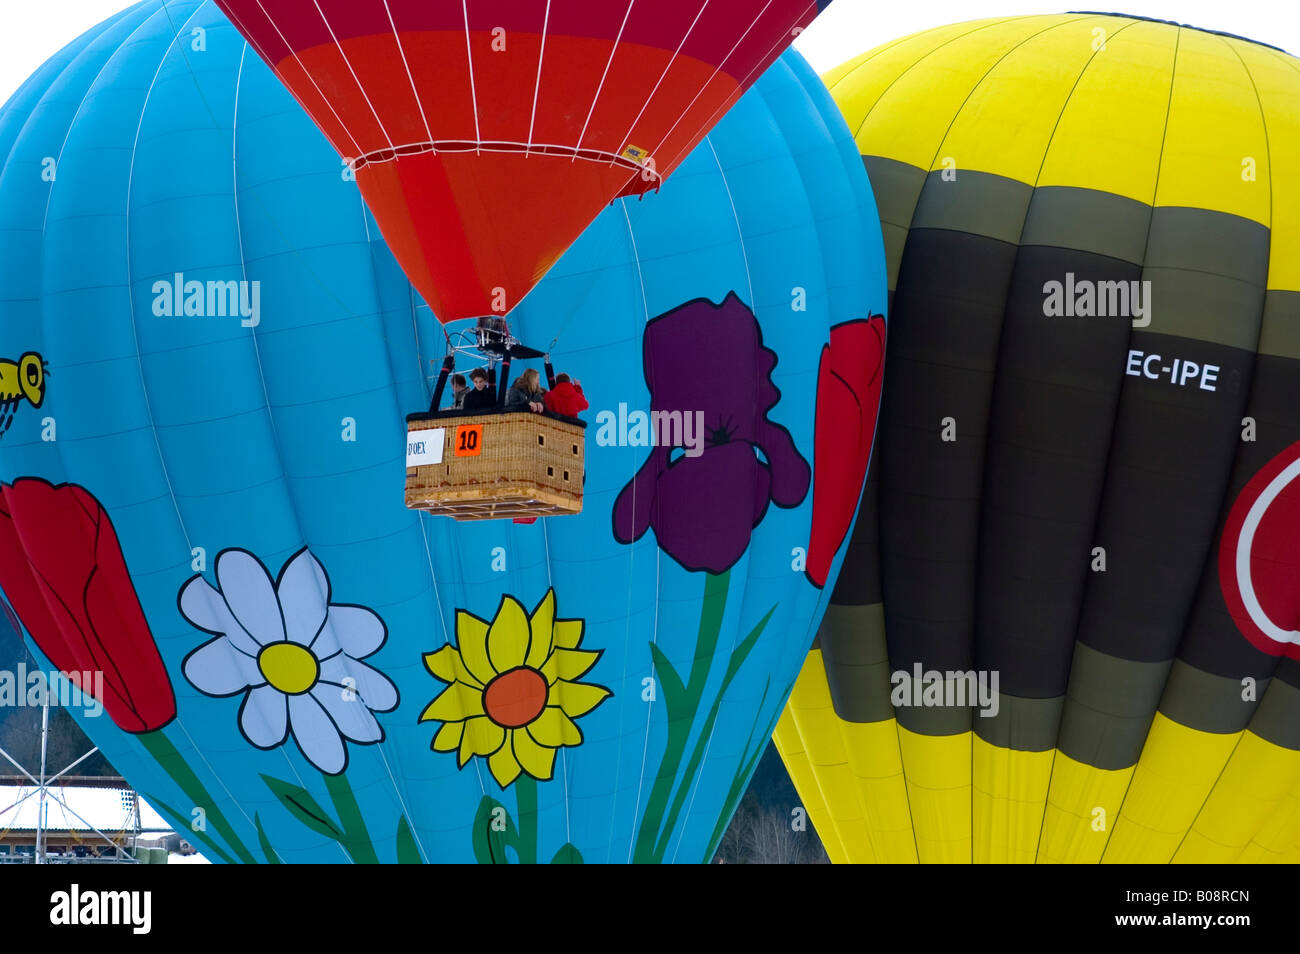 Hot air balloons, International Balloon Festival in Château-d'Oex, Vaud, Switzerland Stock Photo